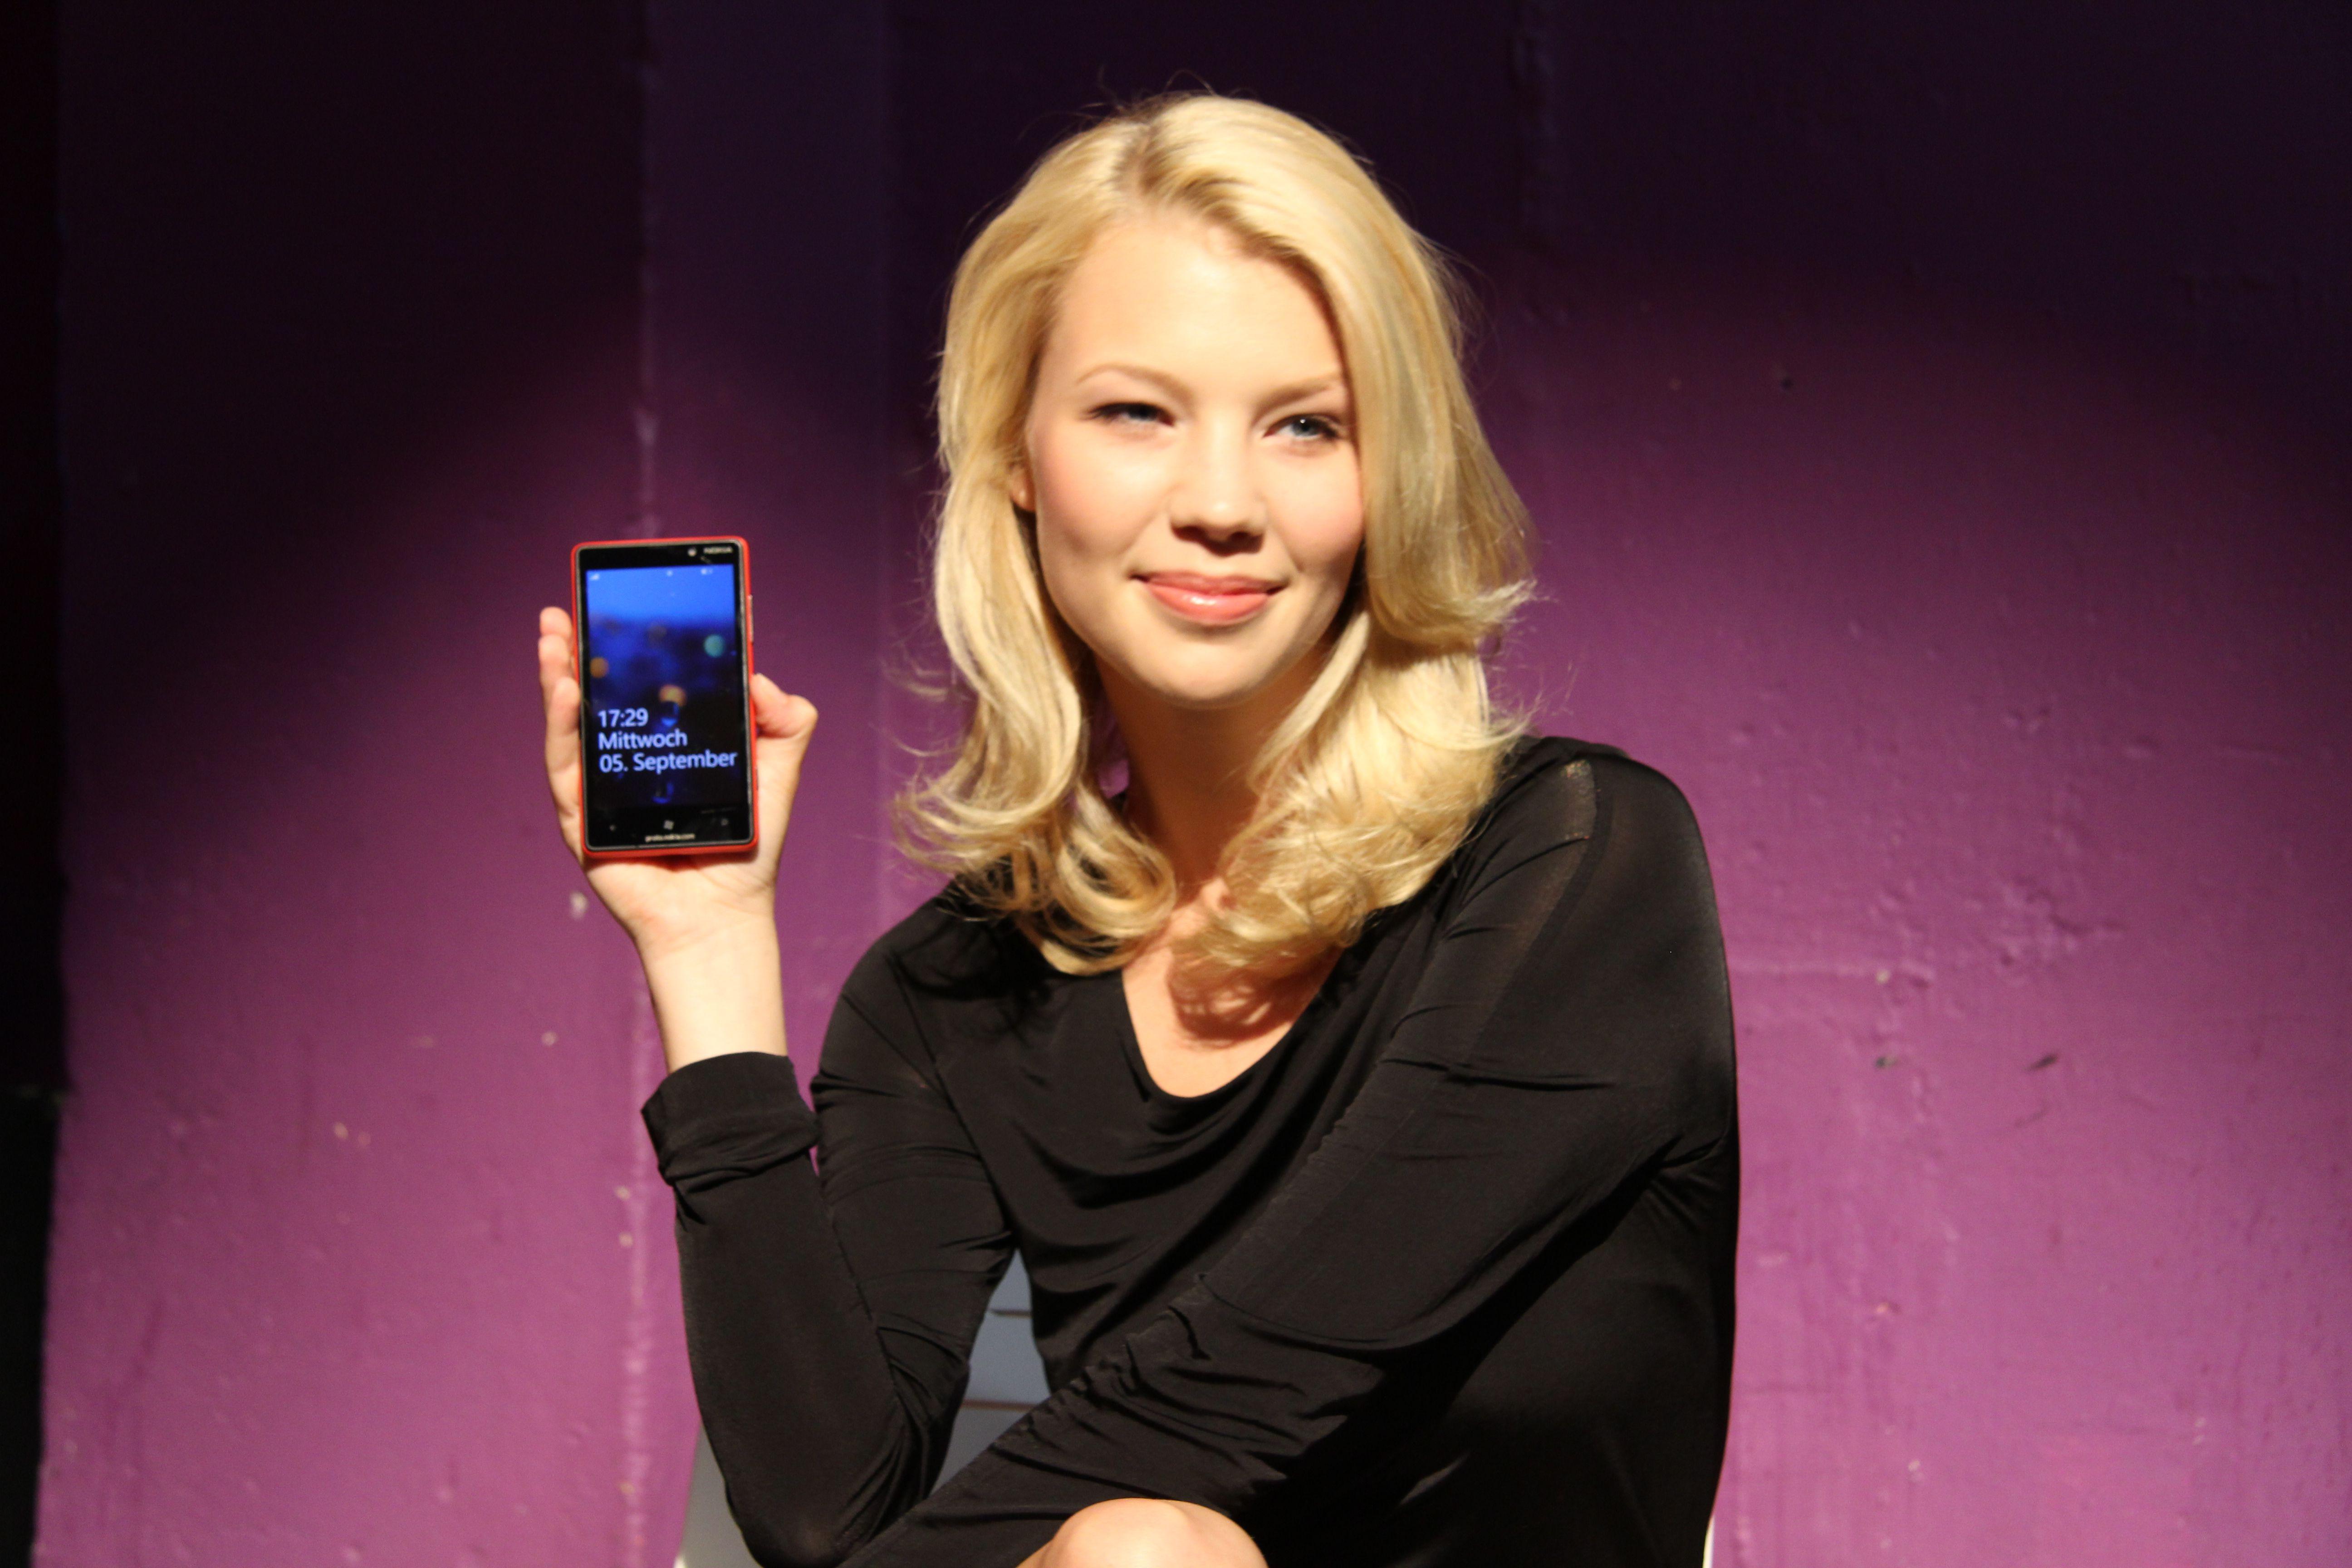 Nokia-Lumia-920-1-200.JPG?nocache=1346920329295